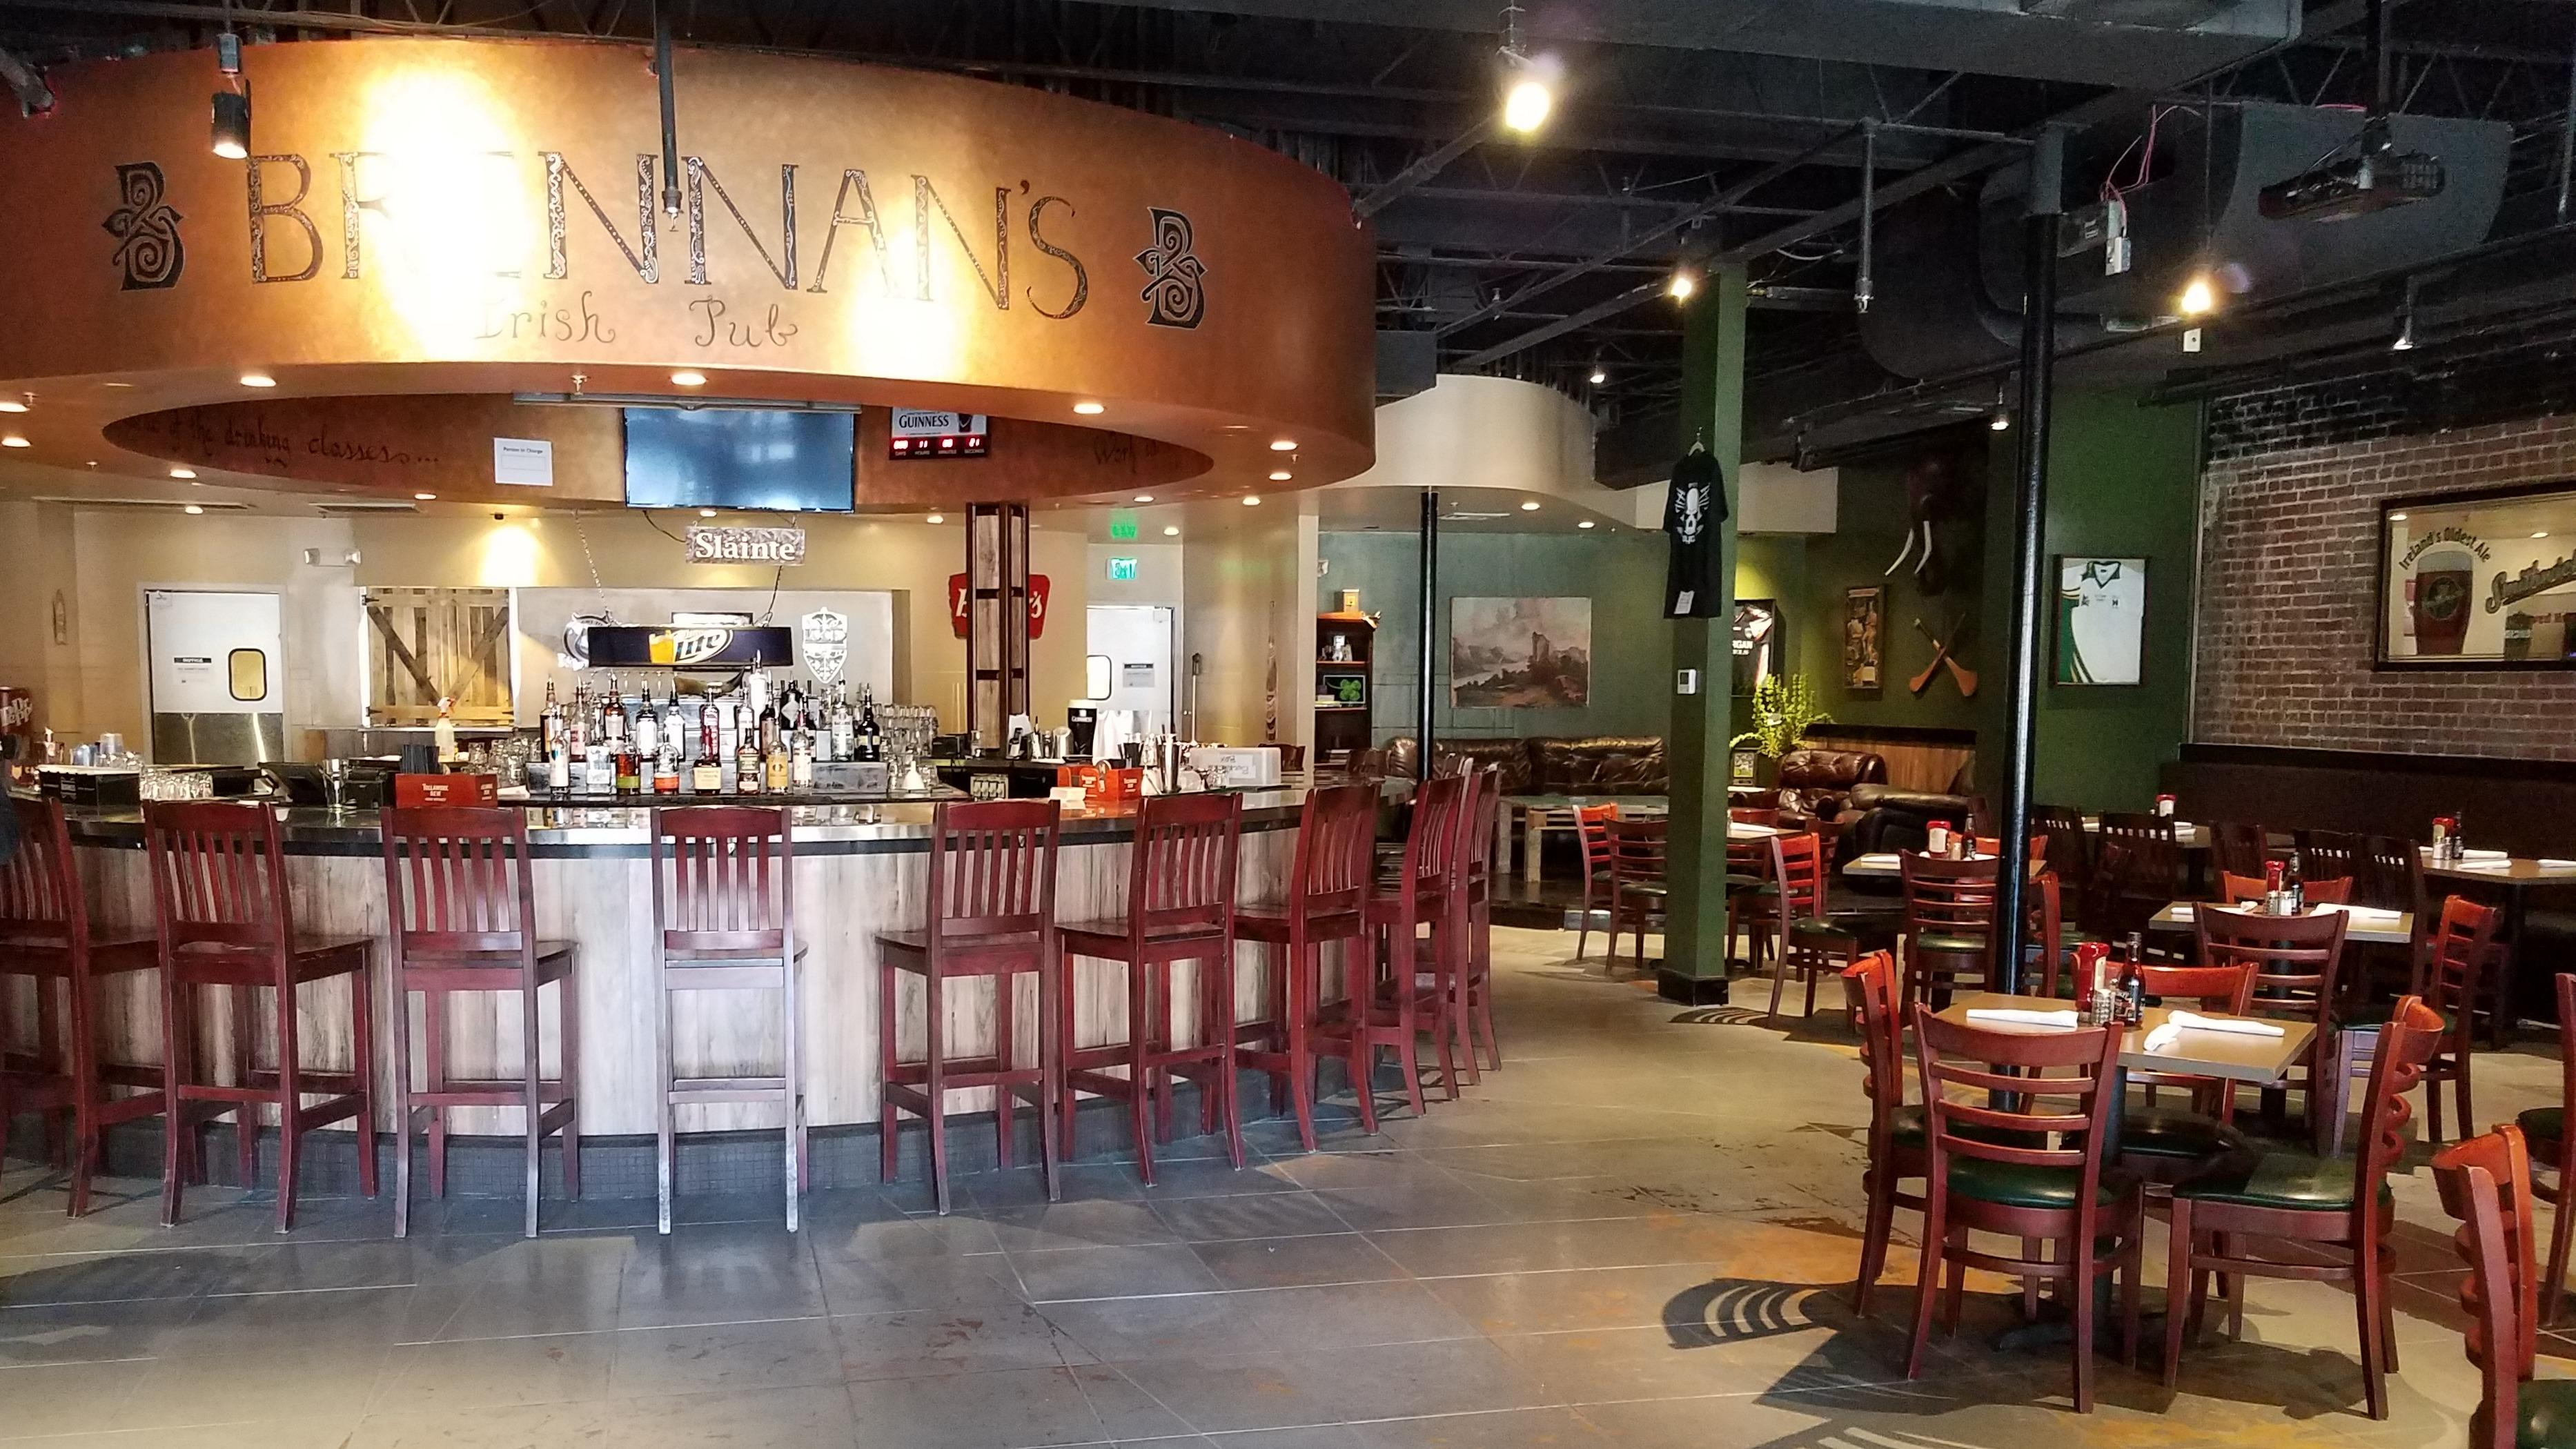 American Express Near Me >> Brennan's Irish Pub Coupons near me in Birmingham, AL 35205 | 8coupons